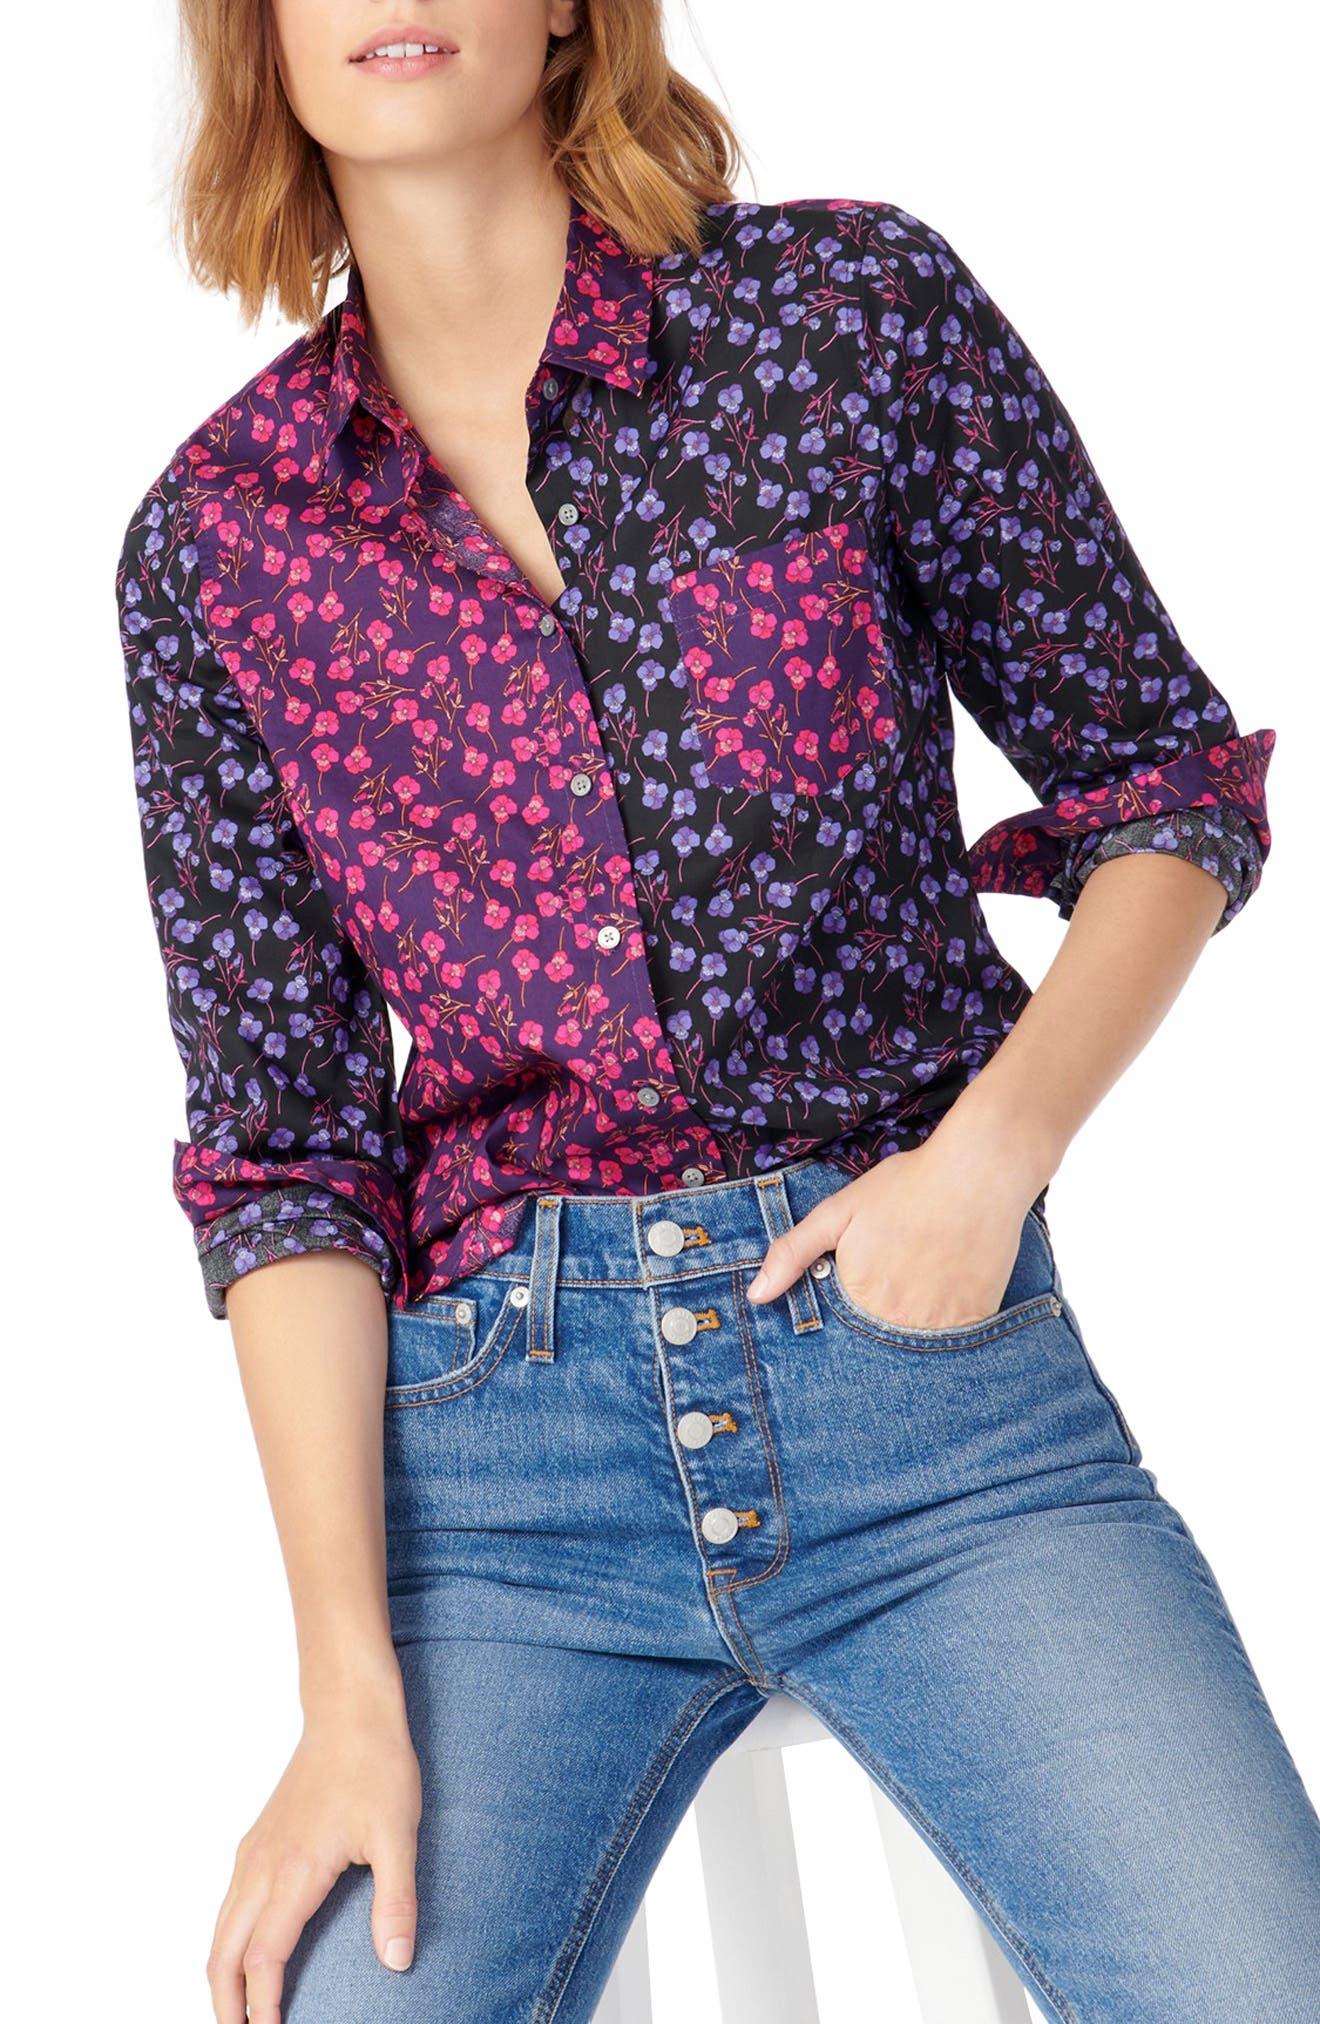 J.Crew Liberty® Print Slim Perfect Shirt | Nordstrom